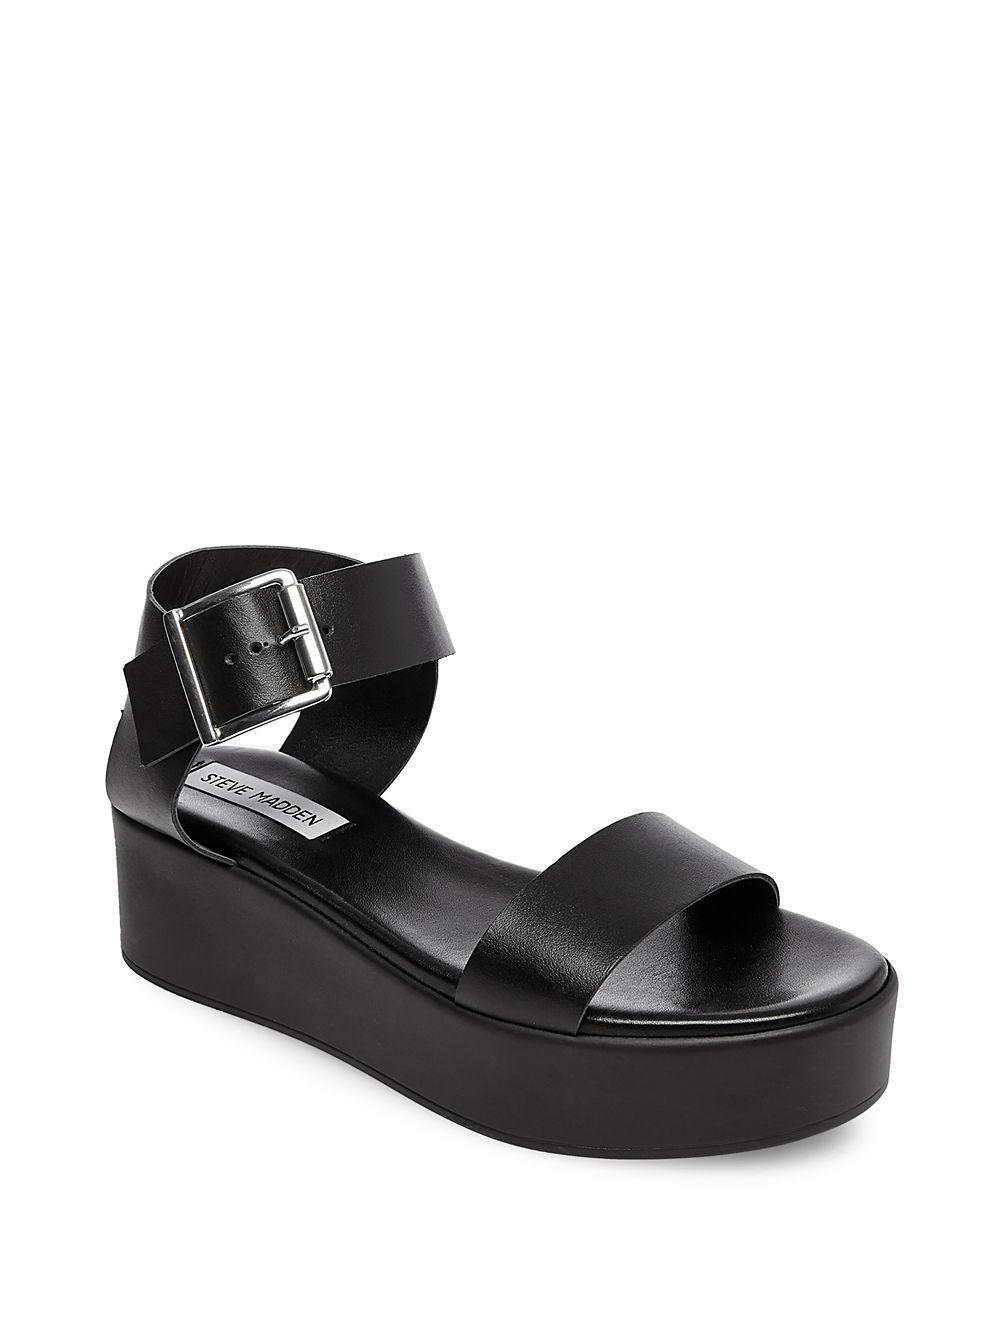 b3a5dd9acf6 Steve Madden Black Recover Leather Platform Sandals